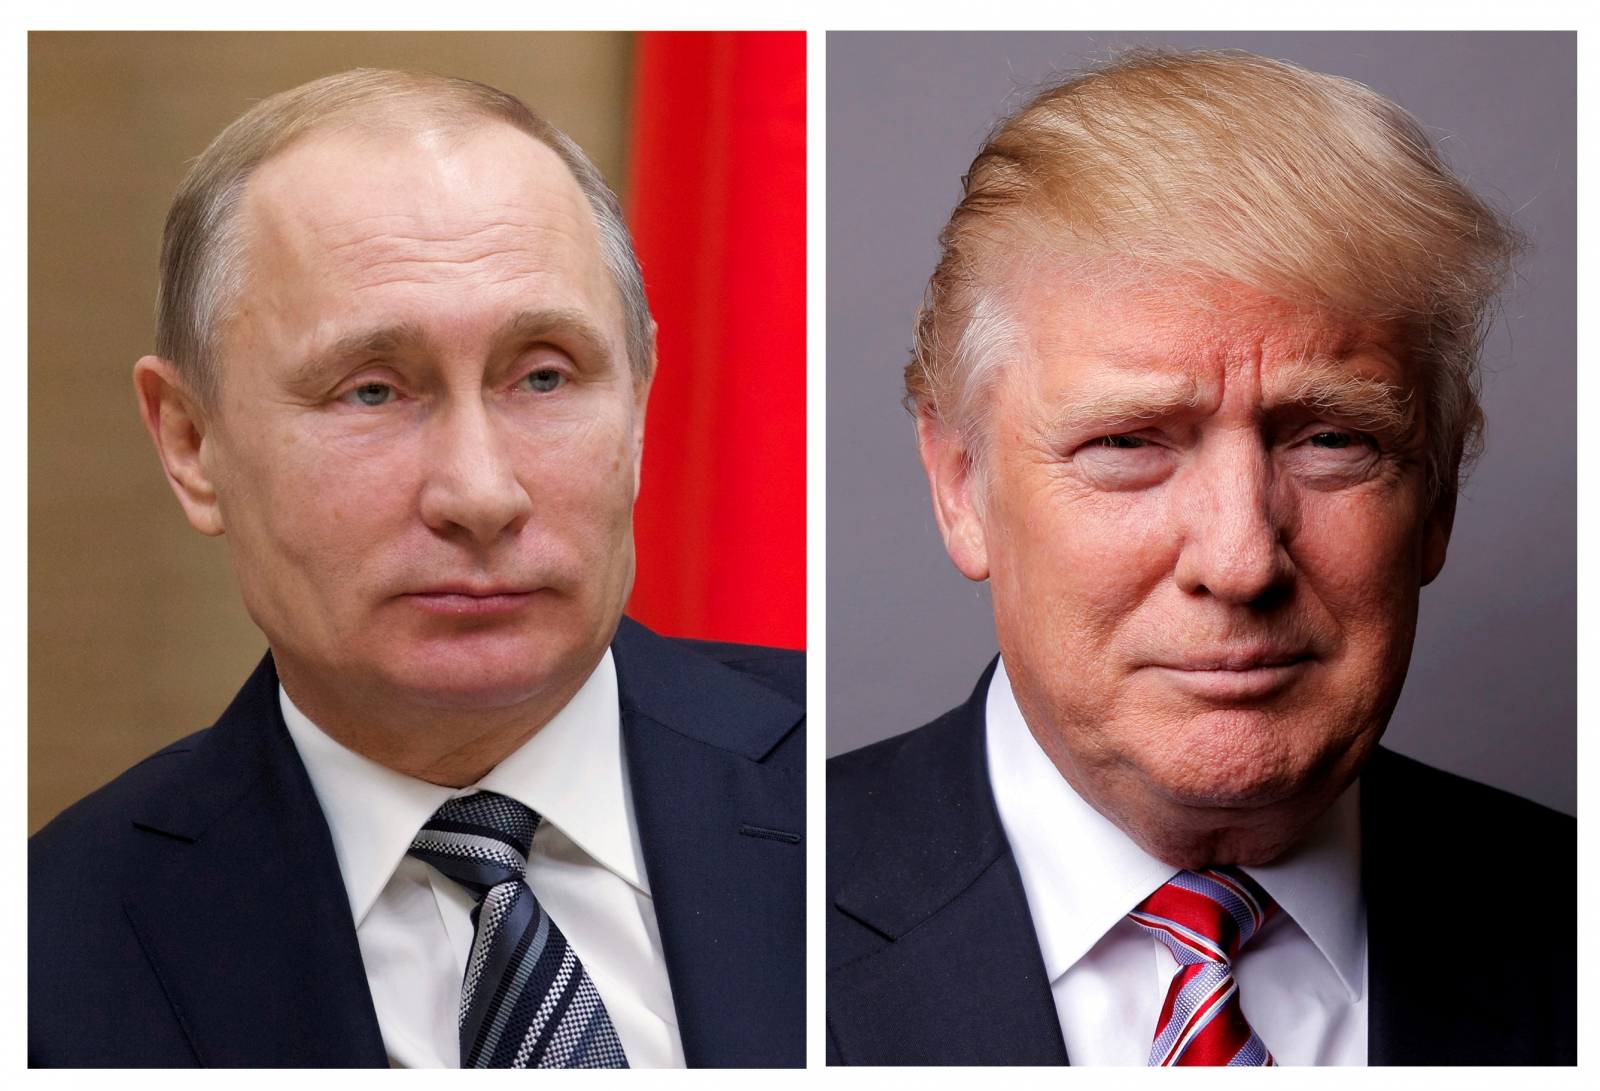 Vladimir Putin on Donald Trump